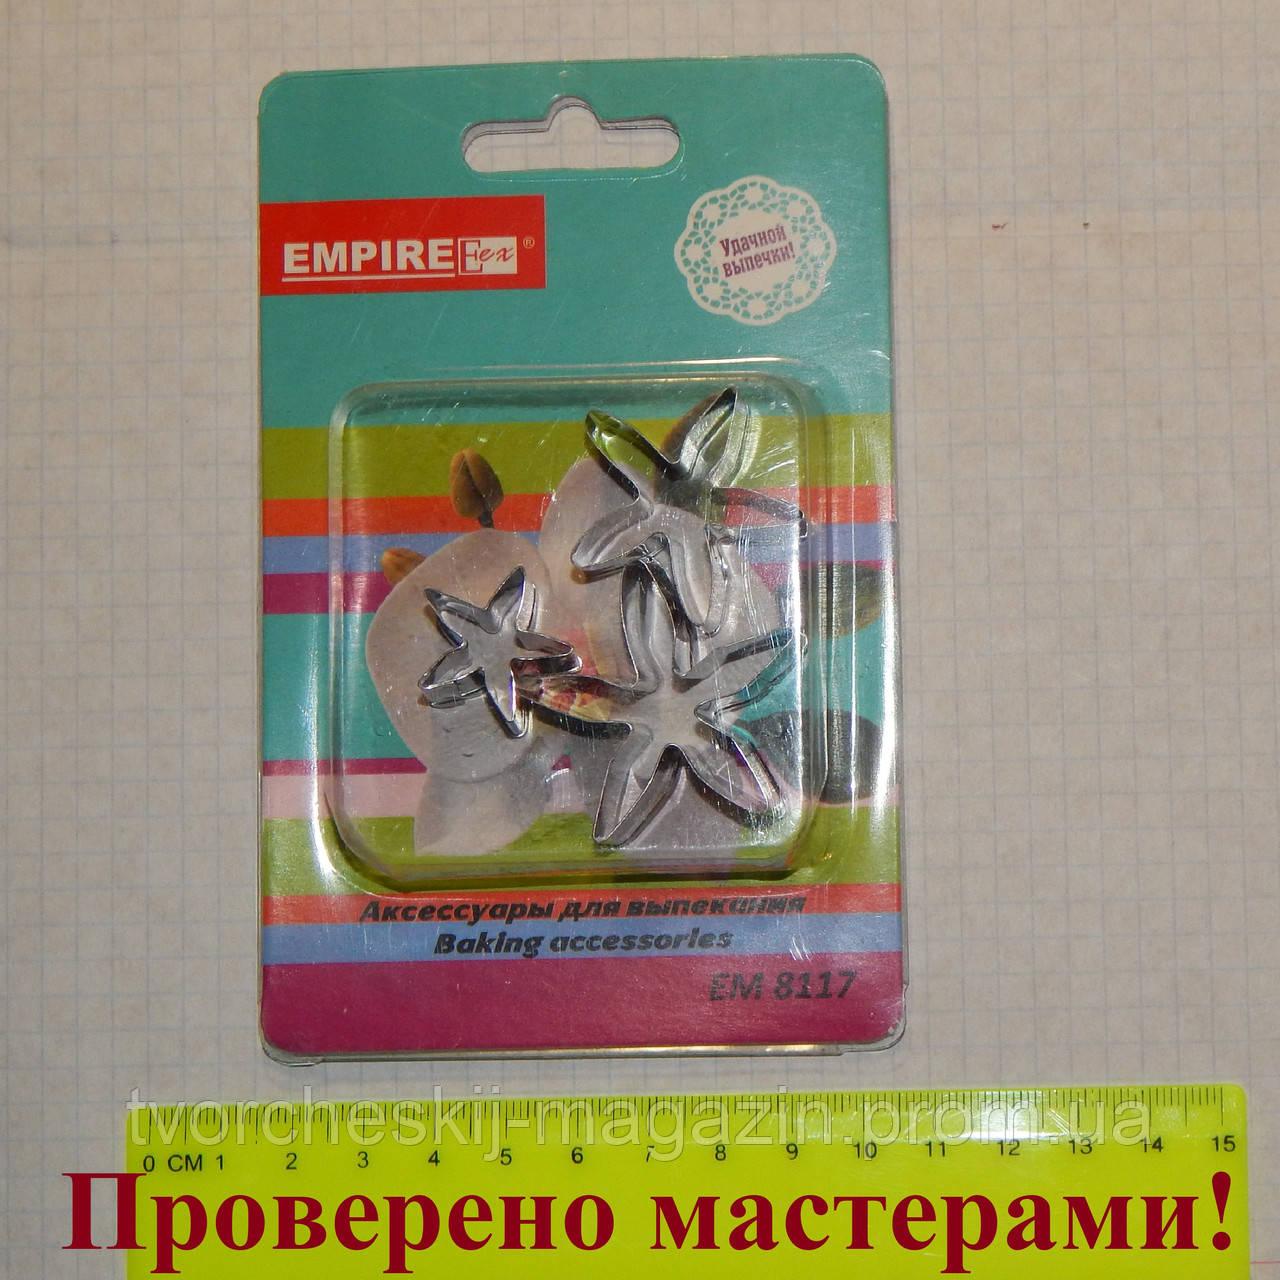 Металлические каттеры Чашелистики, набор 3 шт